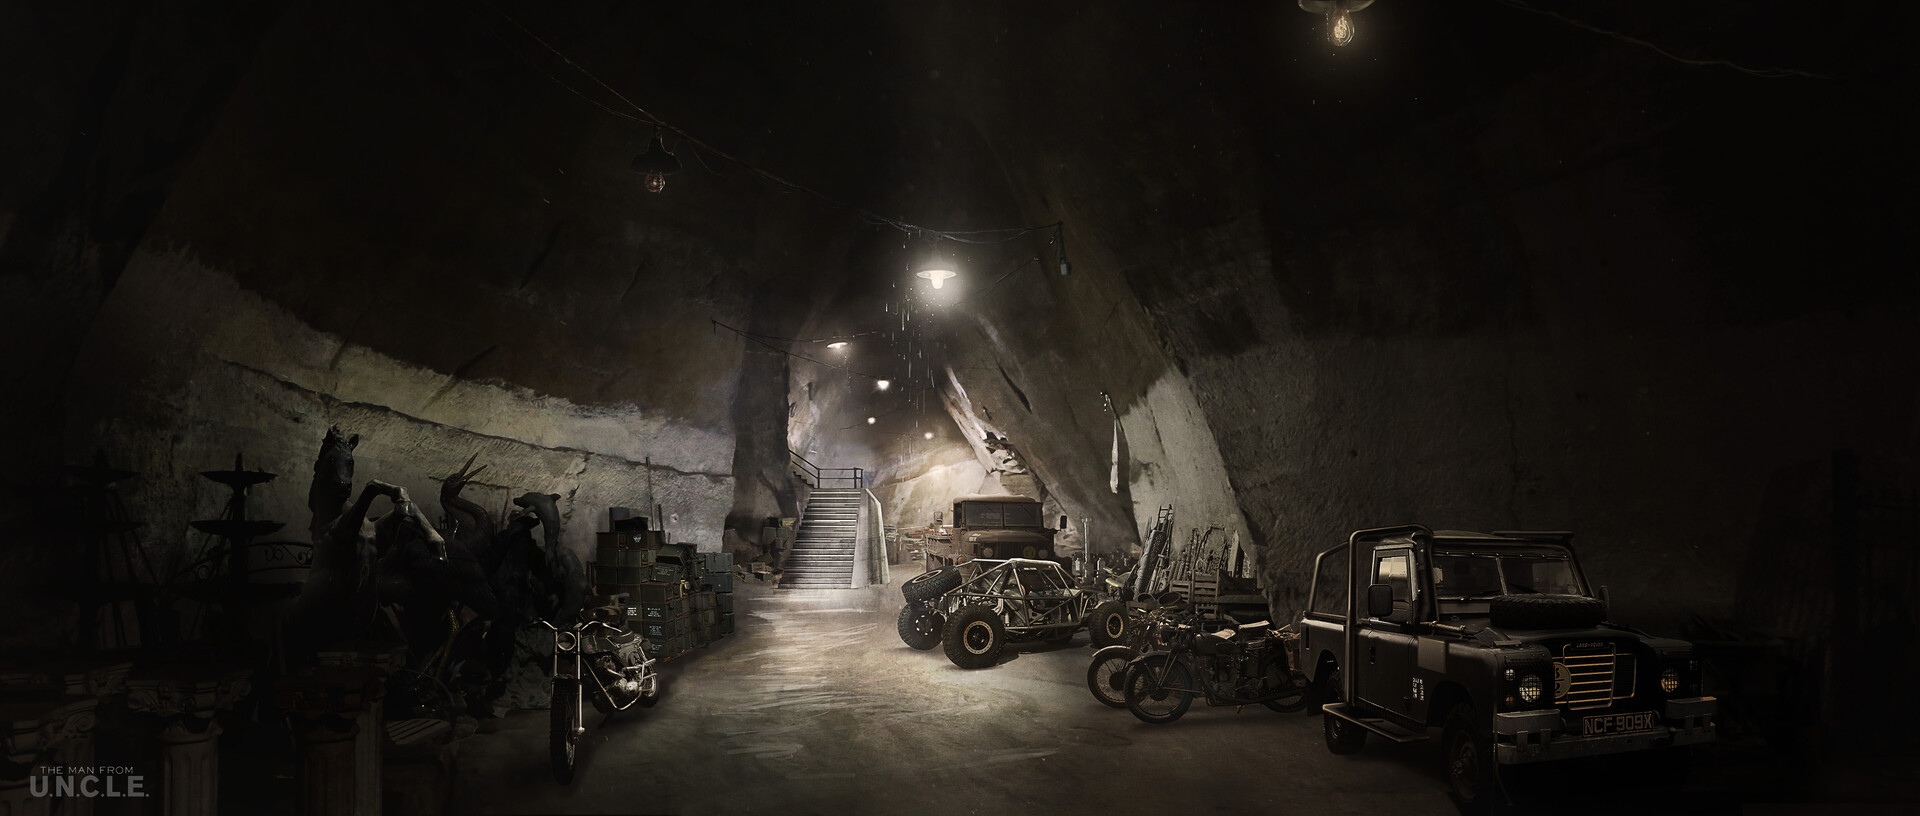 Kieran belshaw skorpios island caves v005 web